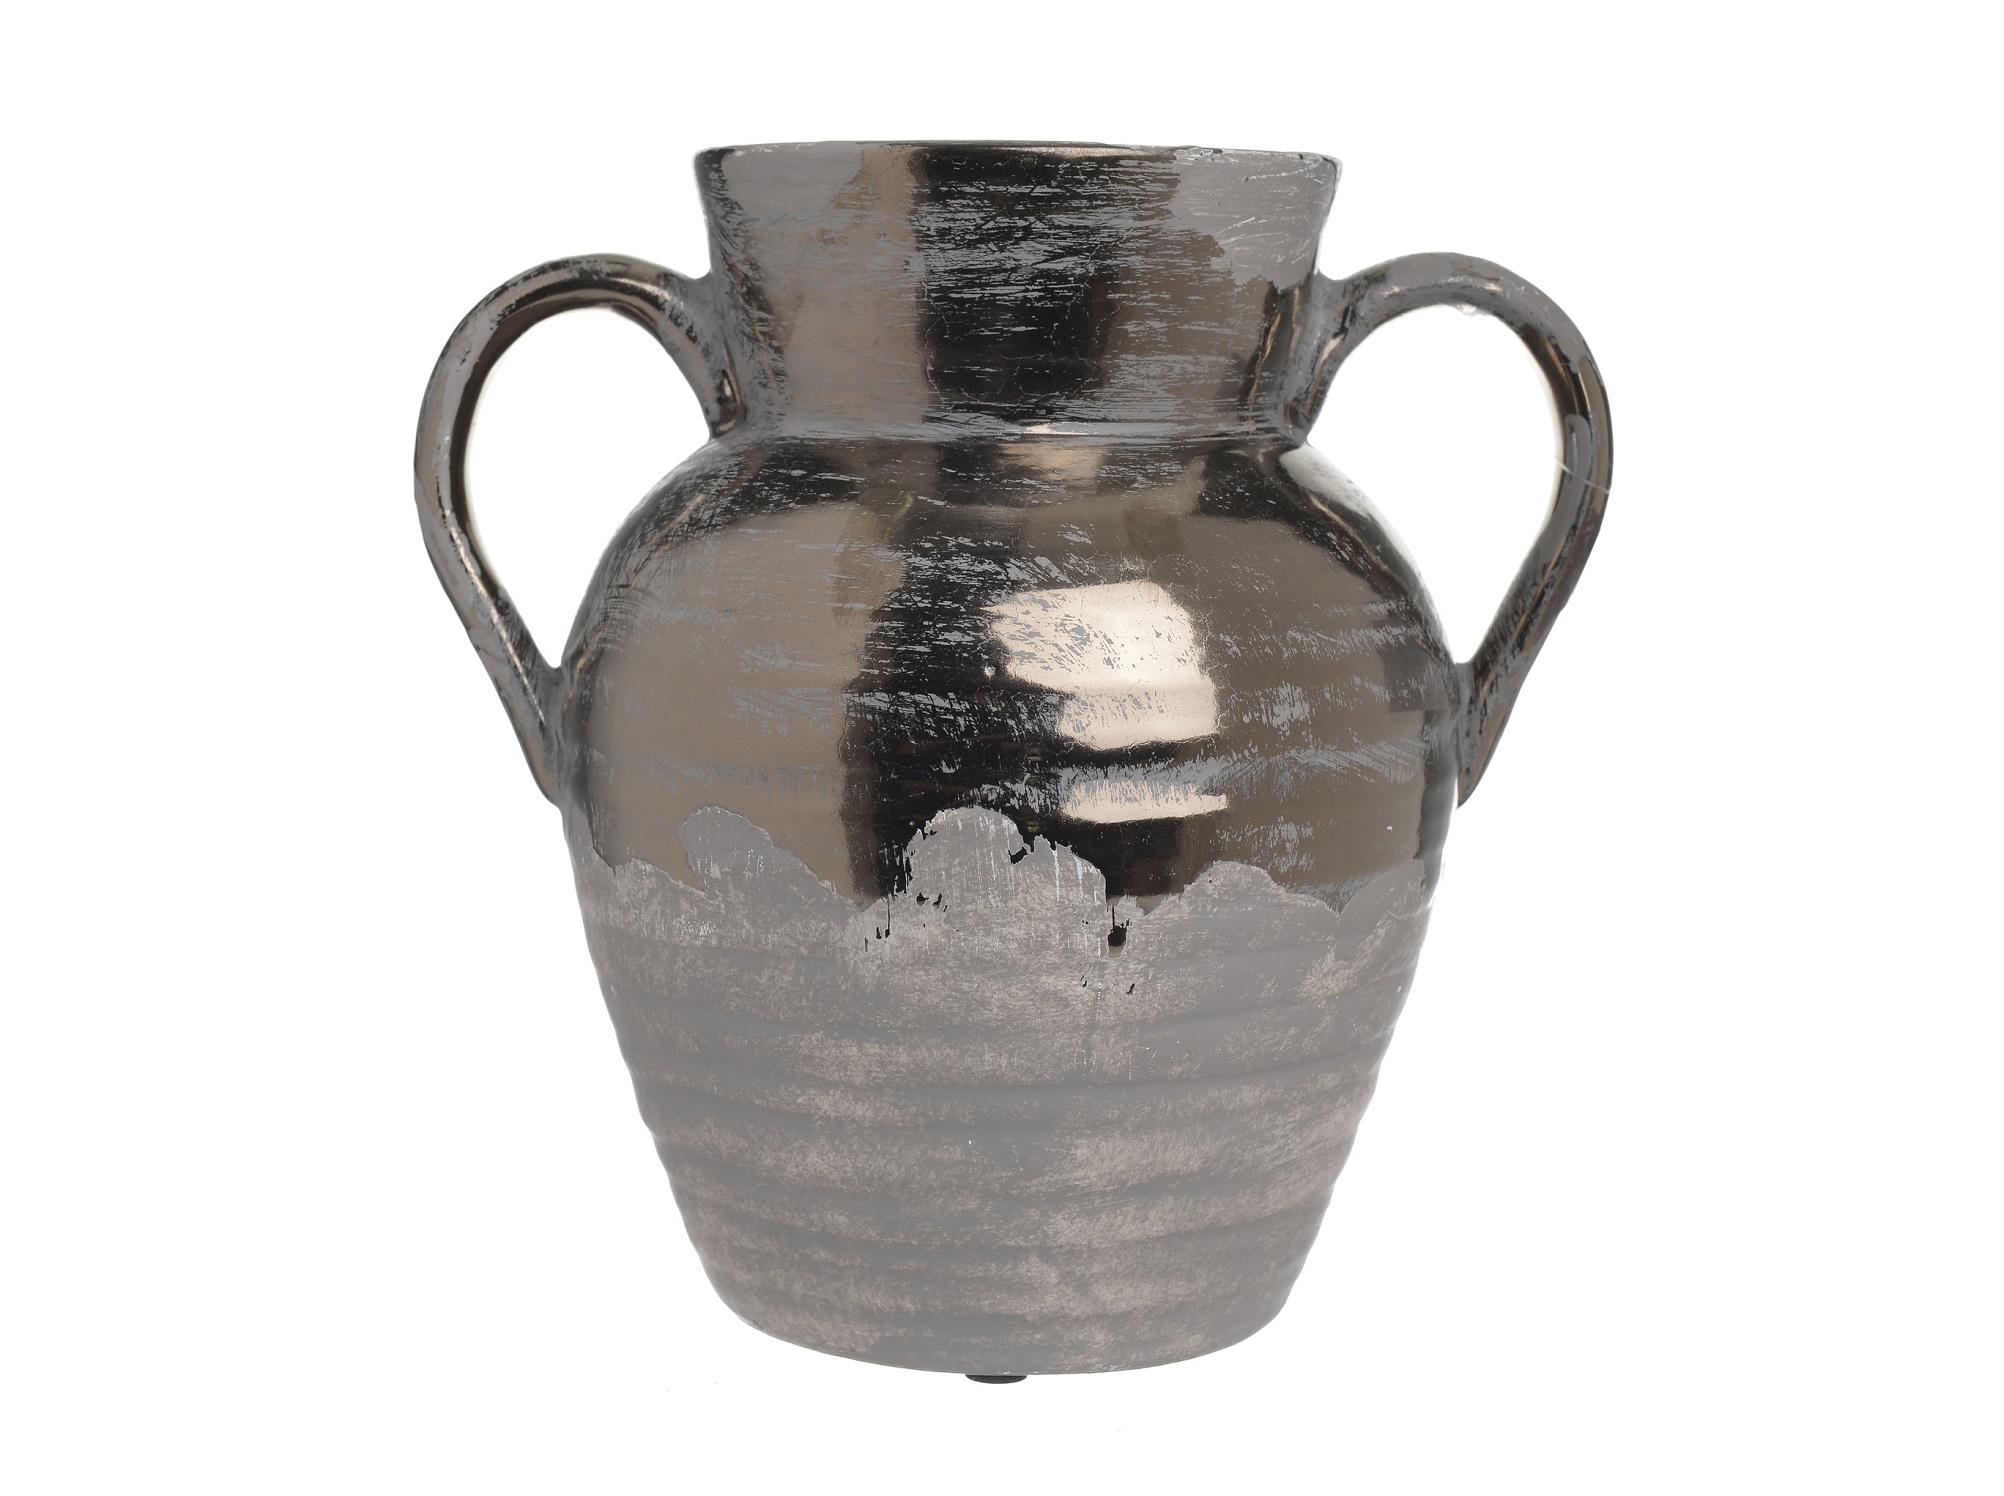 Ваза CohenВазы<br><br><br>Material: Керамика<br>Ширина см: 23.5<br>Высота см: 23.0<br>Глубина см: 17.5